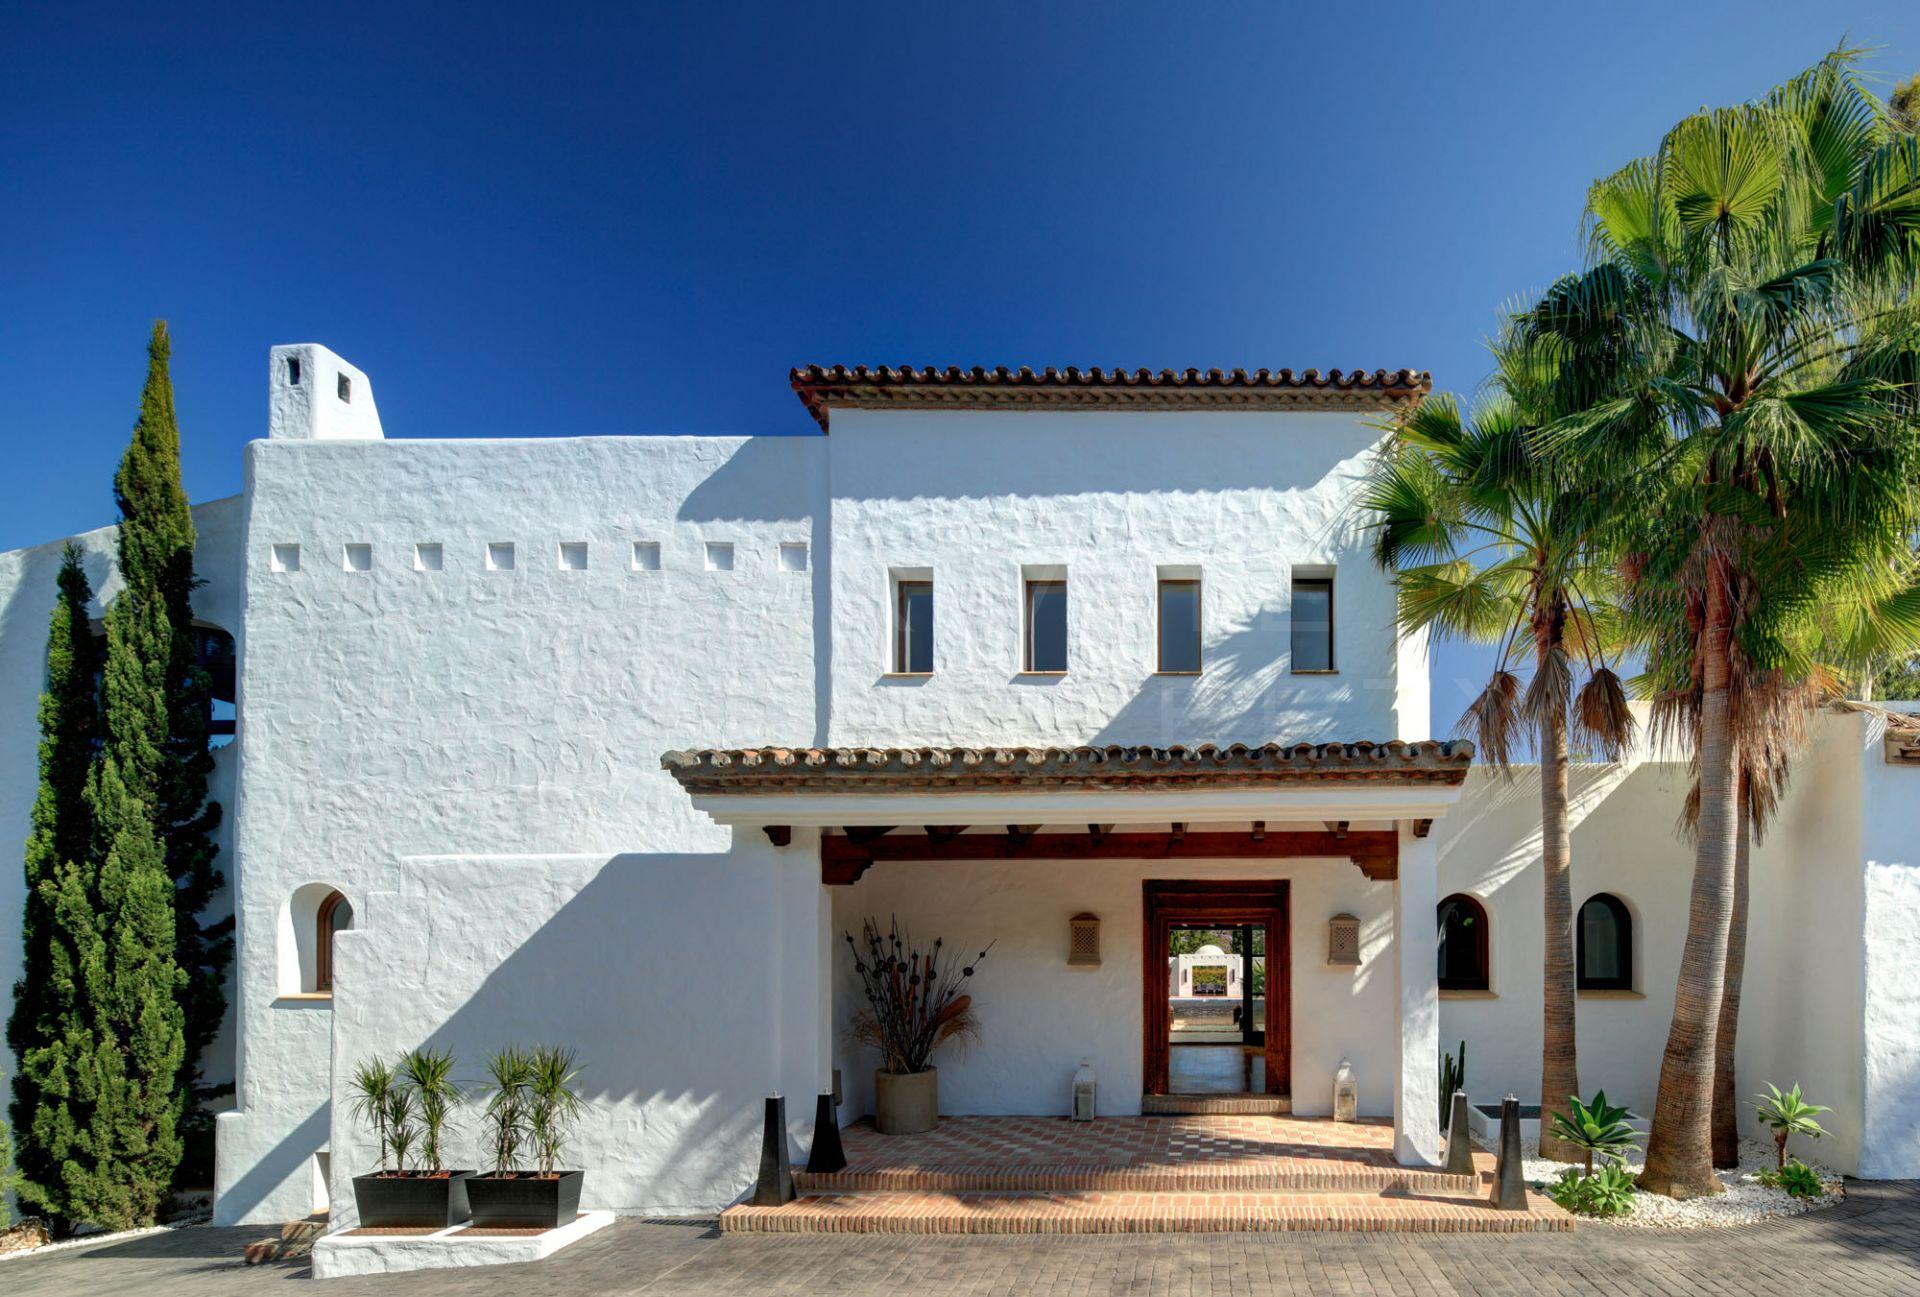 Immaculate villa in Puerto Banus